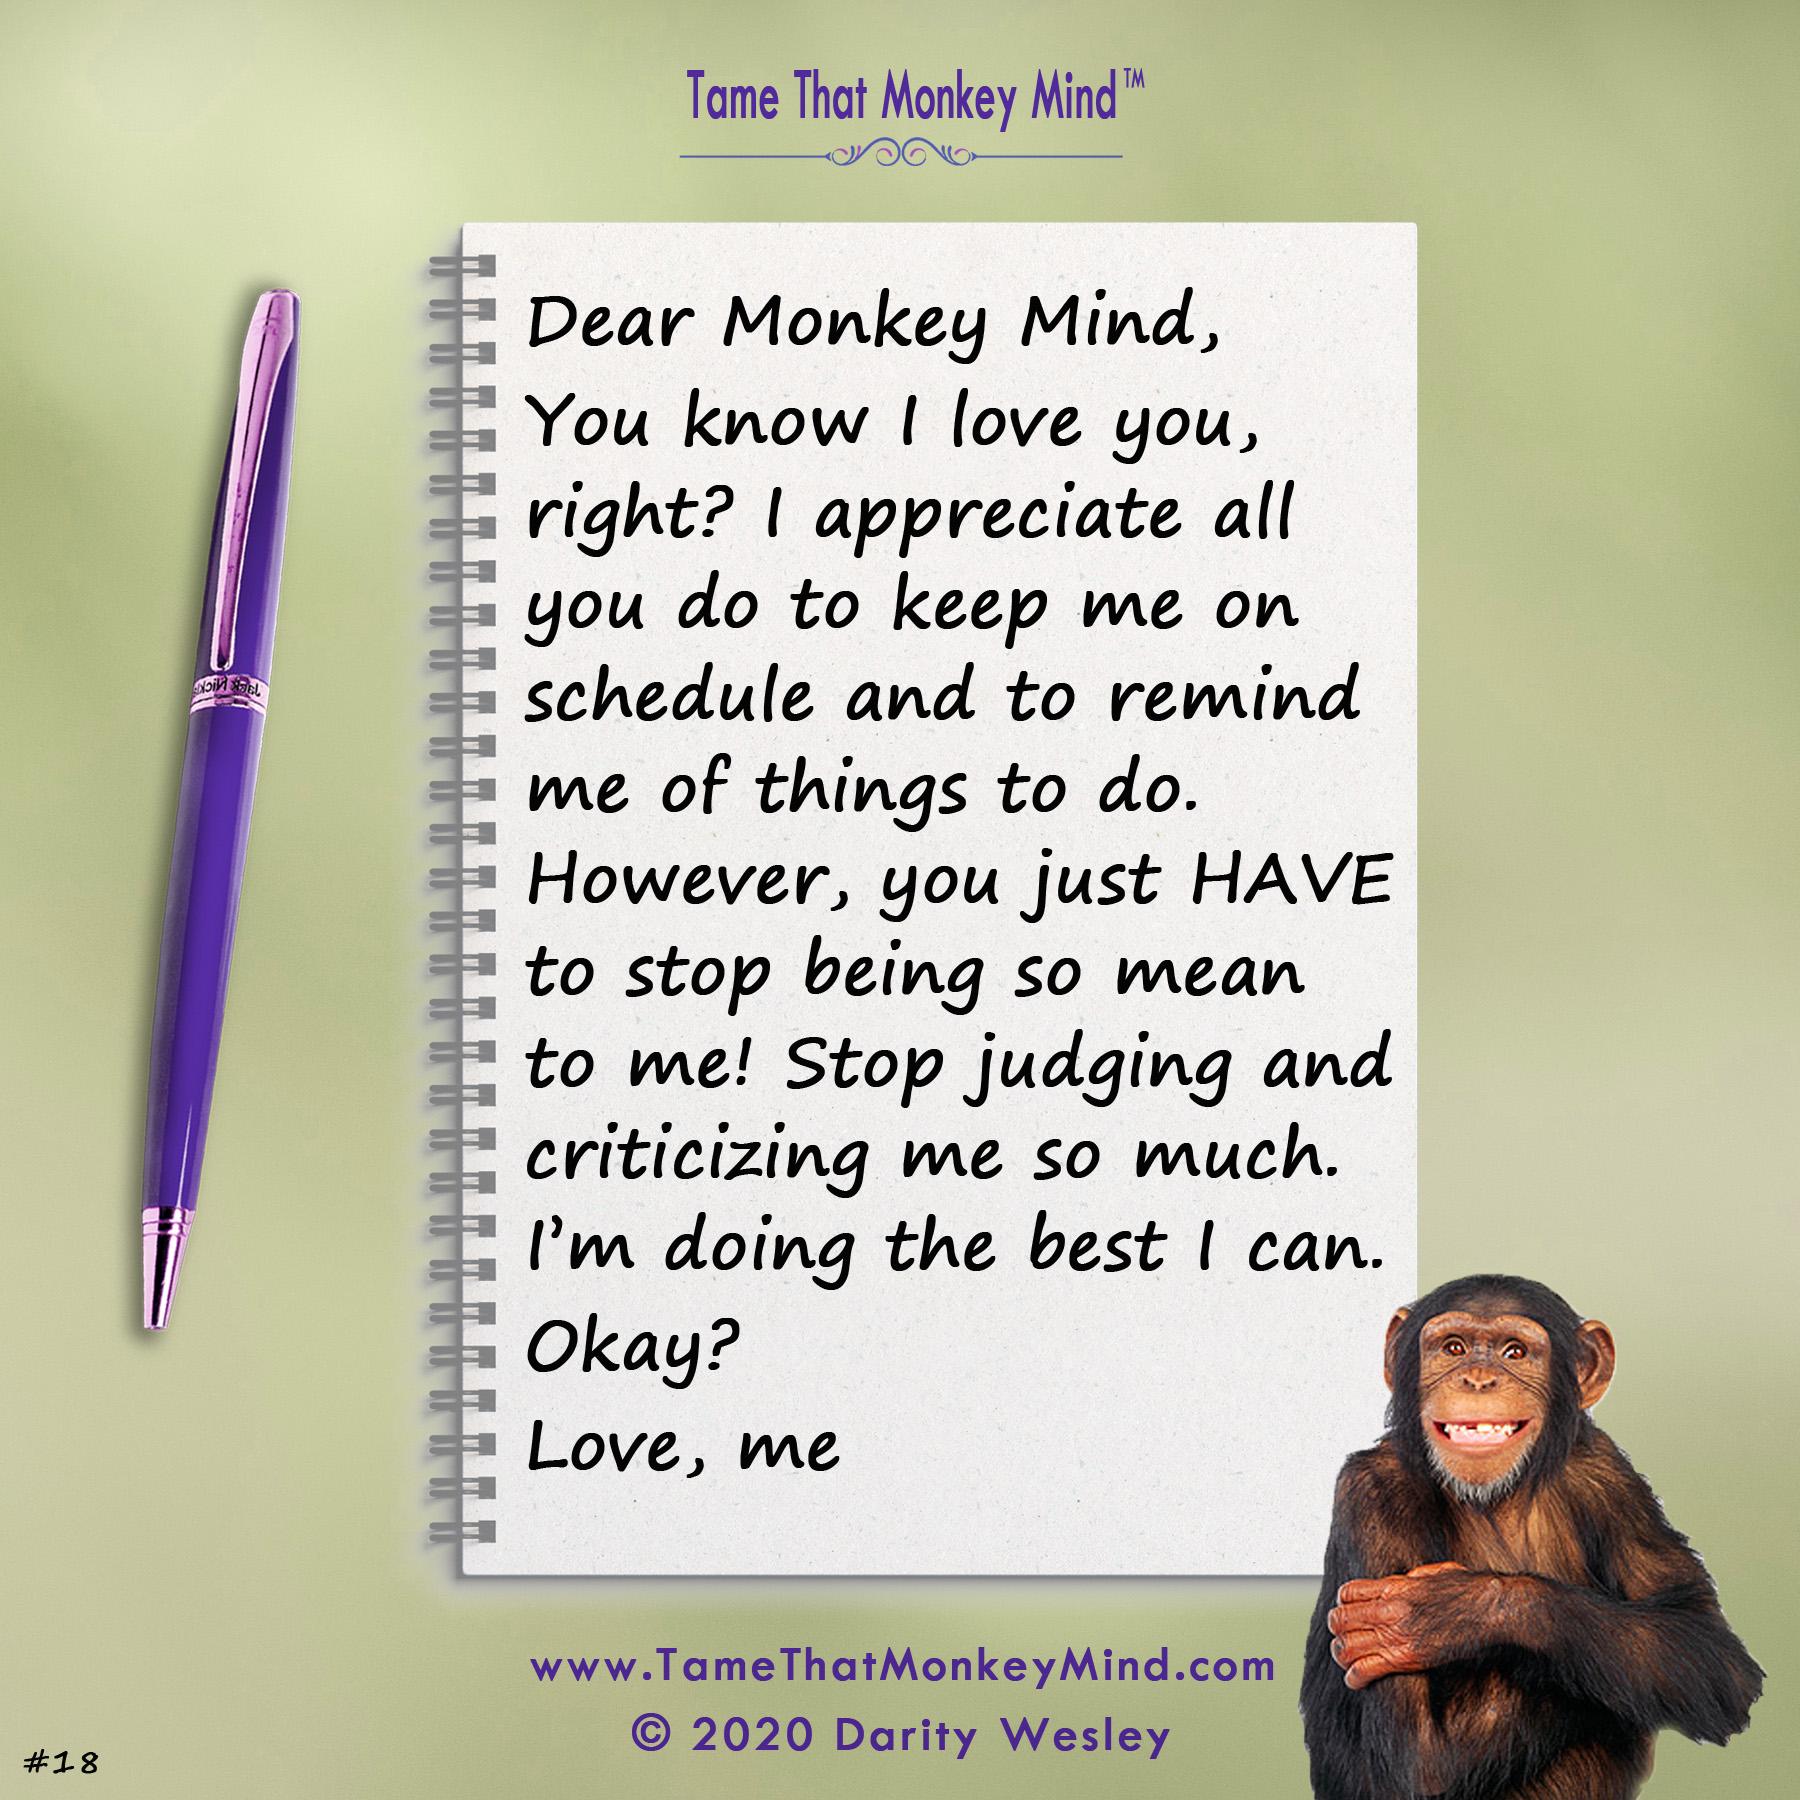 Dear Monkey Mind #18